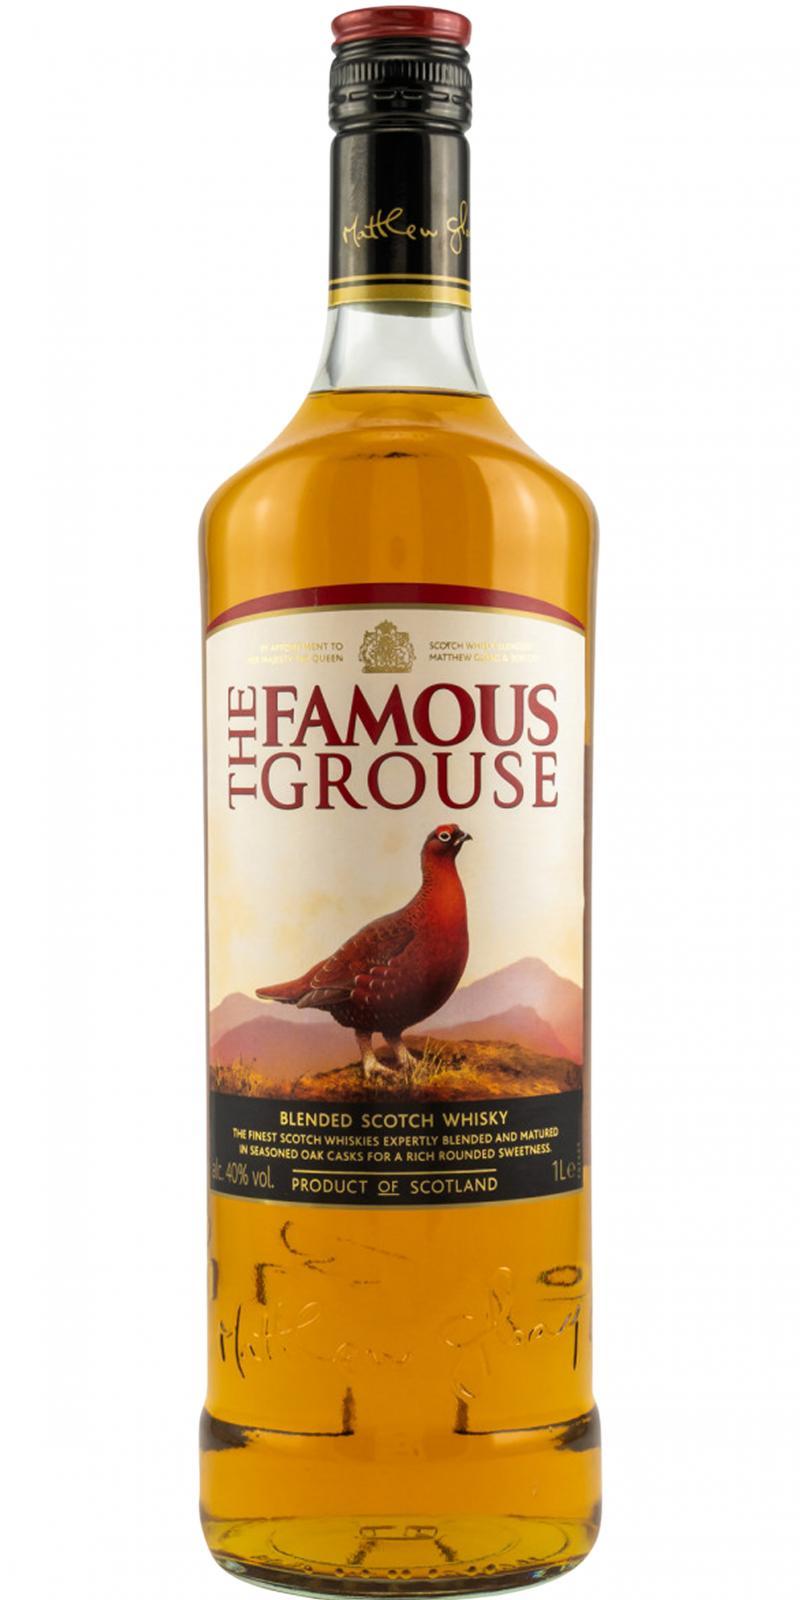 Famous Grouse Finest Scotch Whisky Longdrink Glas Bar Gastro 2cl 4cl